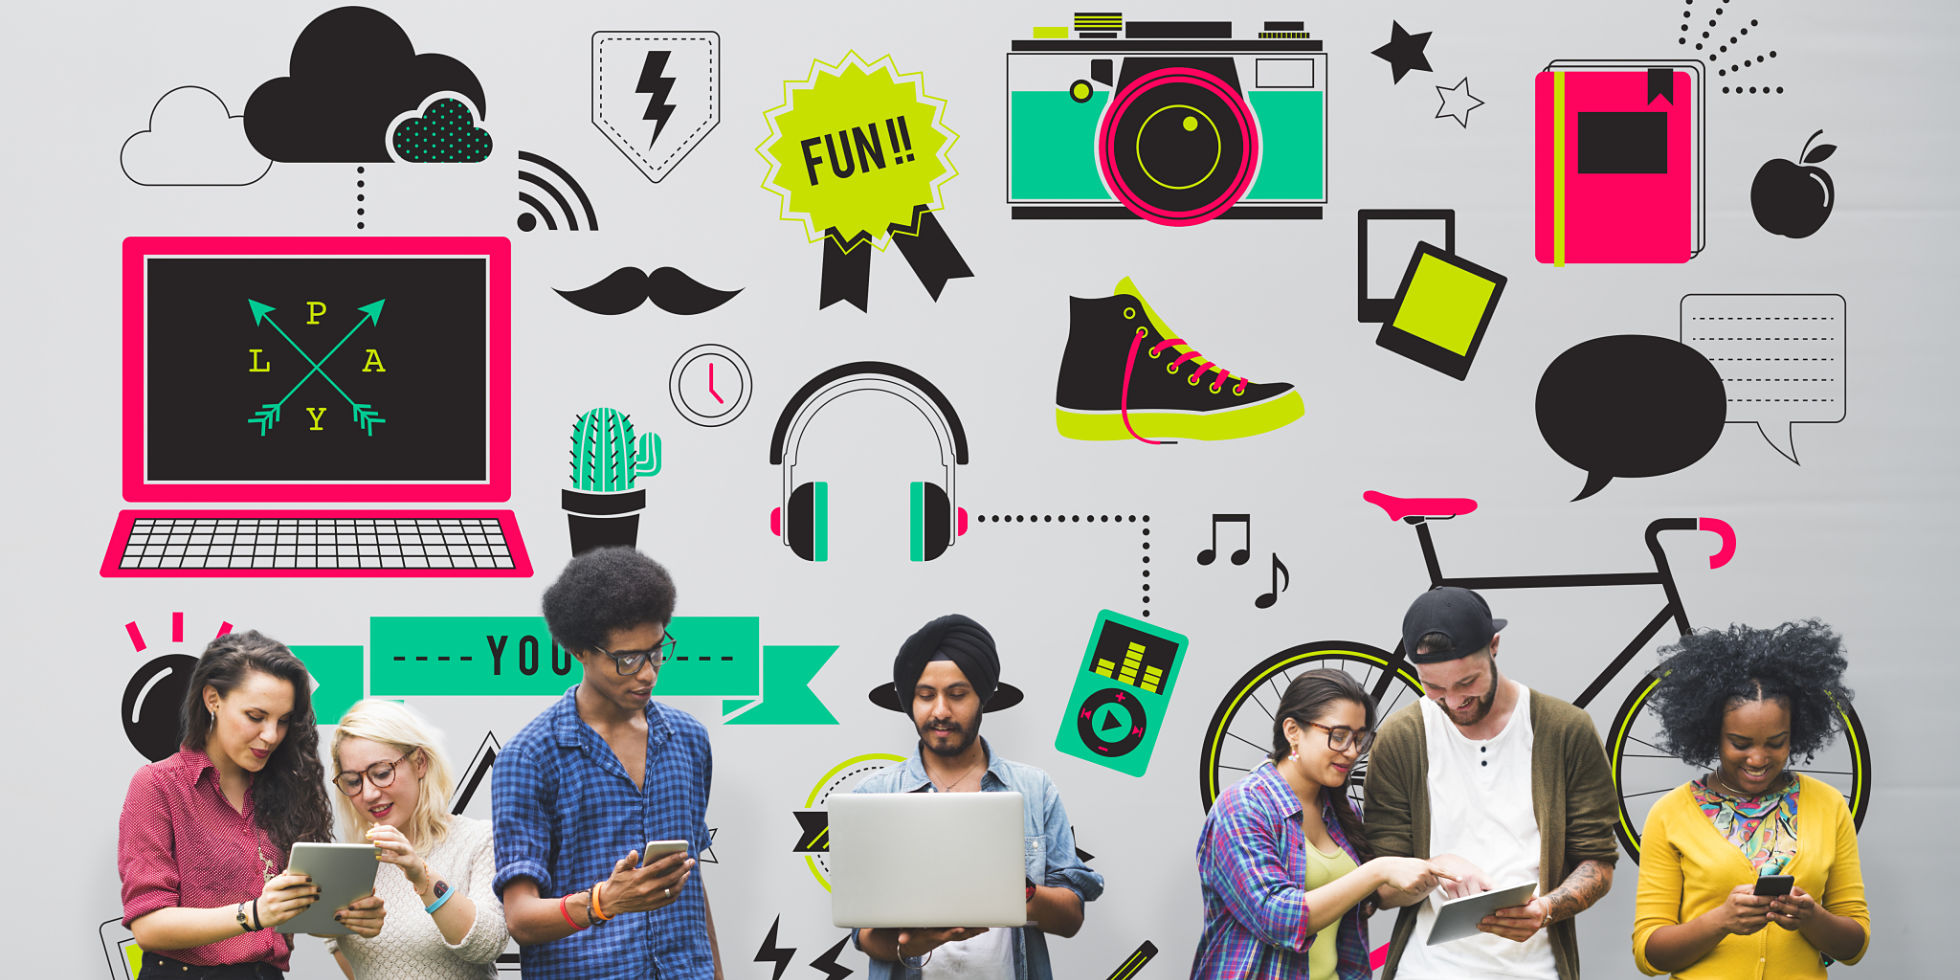 The Team, creative branding agency, brand strategy, brand purpose, brand identity, employee engagement, social purpose, generation z, millennials, internal communication